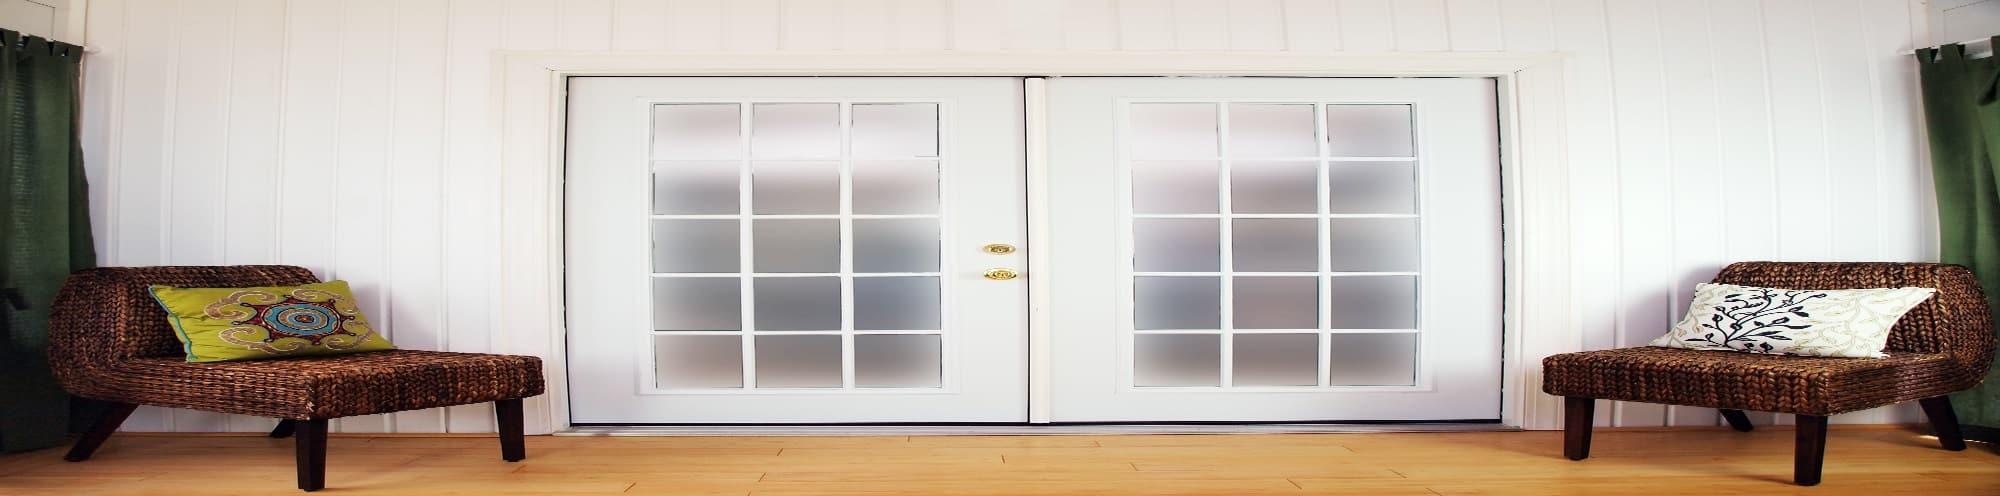 Double French Doors - Big Easy Iron Works